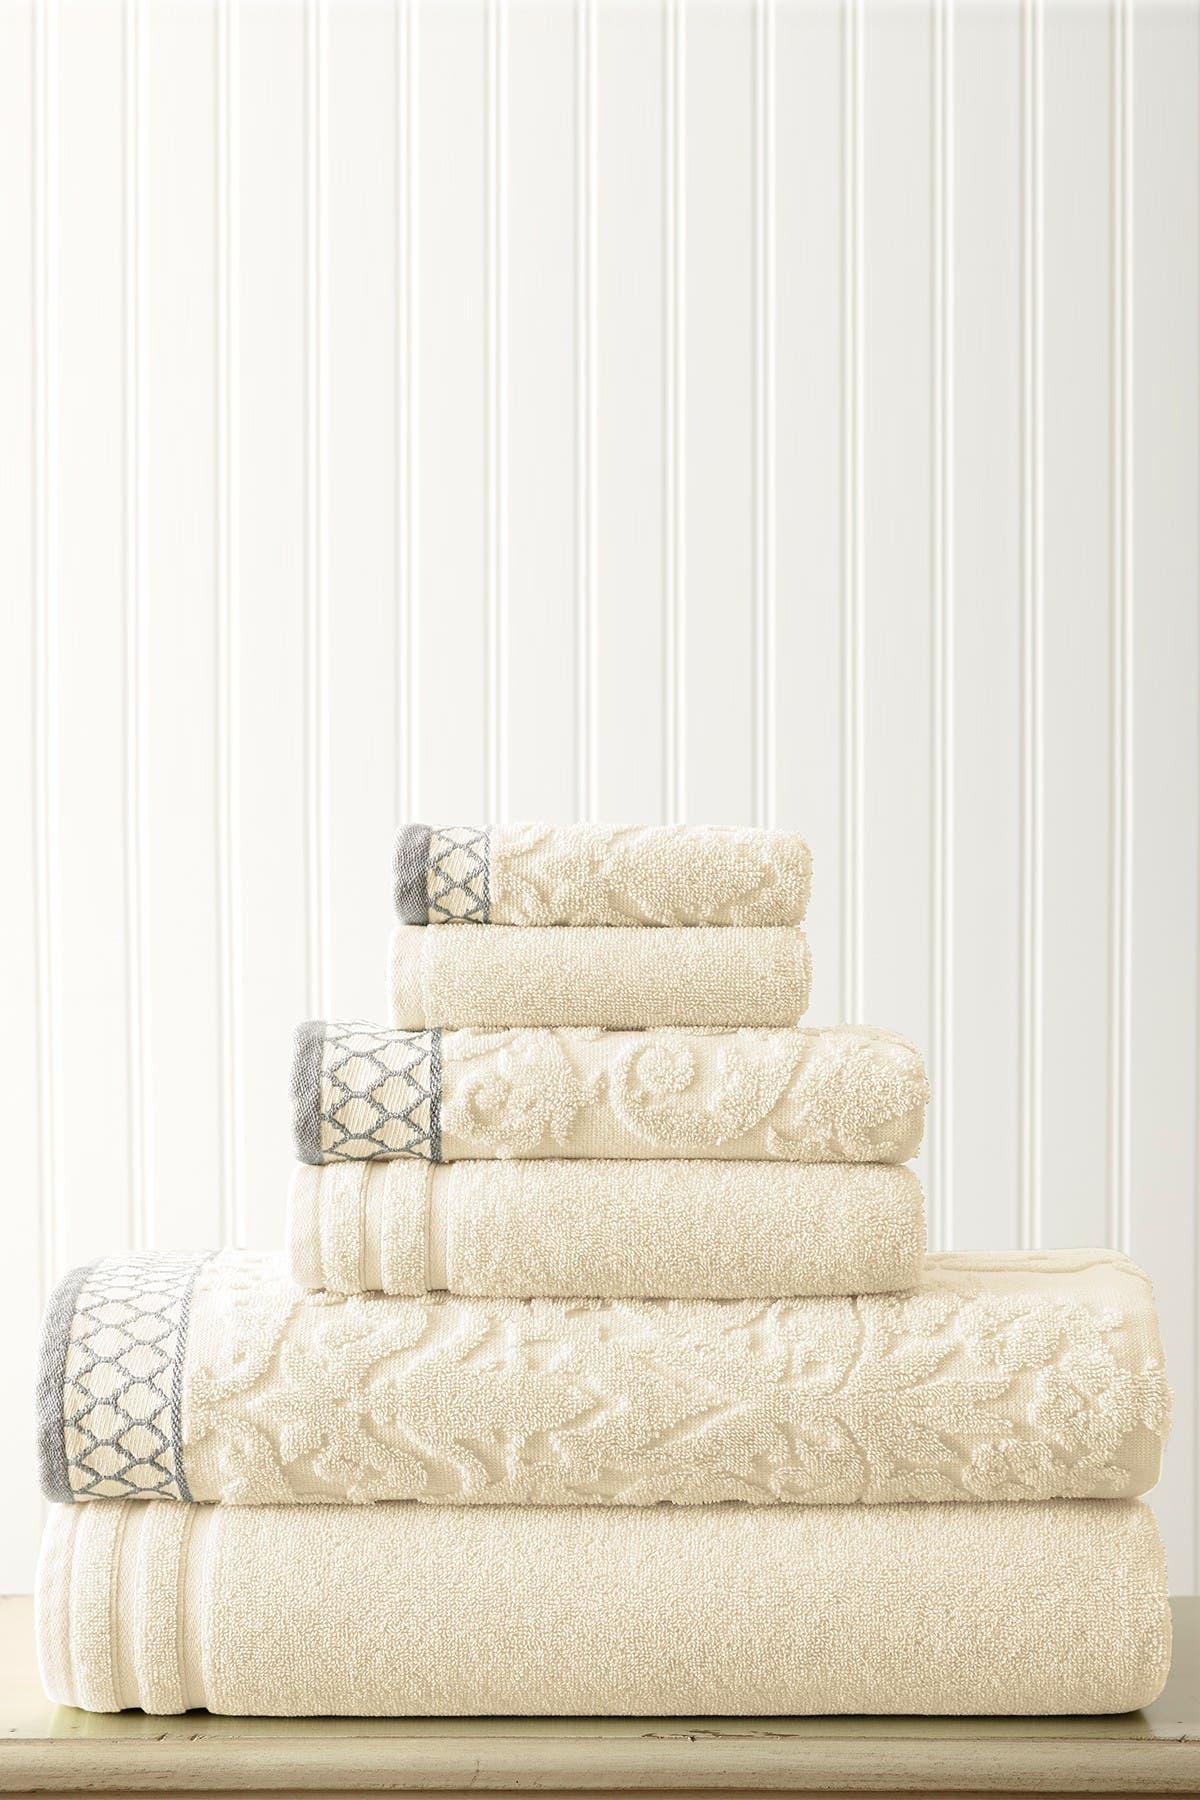 Image of Modern Threads Embellished Border Damask Jacquard Towel 6-Piece Set - Ivory